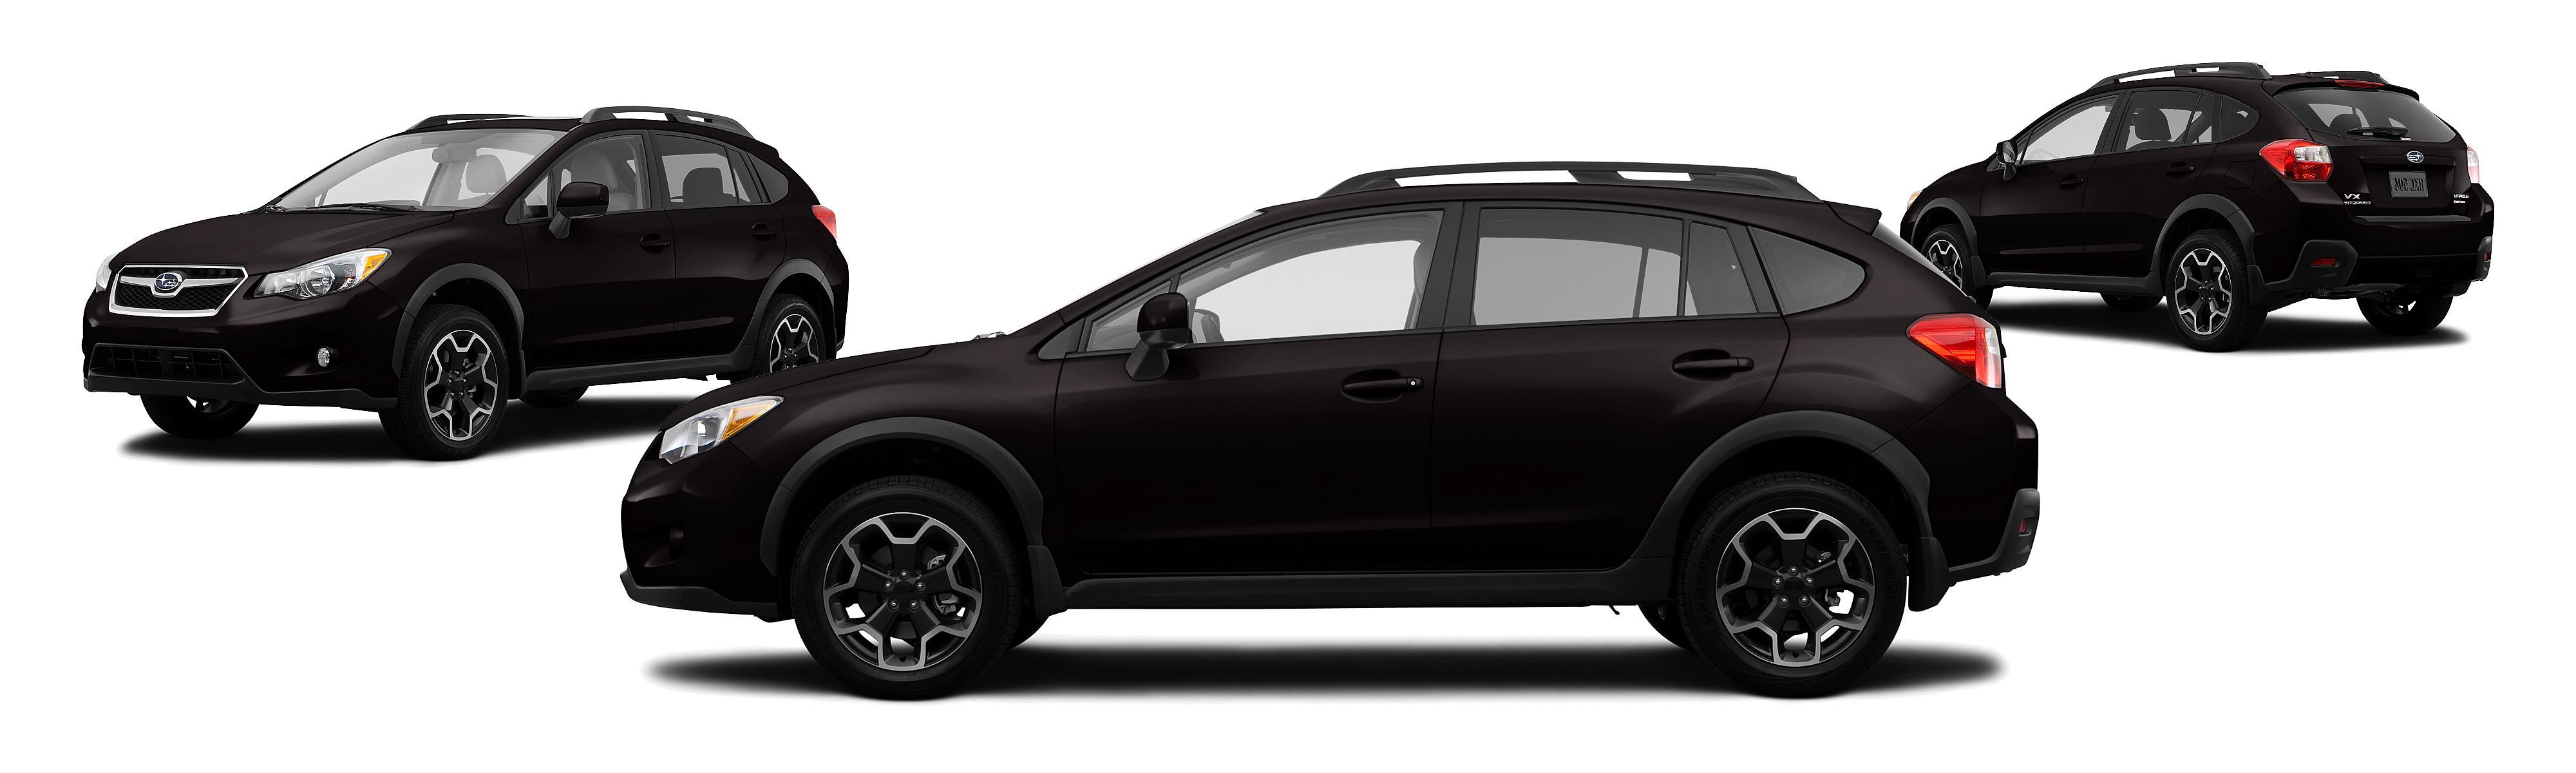 Subaru Impreza 2 0i Engine Diagrams Xv Crosstrek Black Wiring 2014 Awd Premium 4dr Crossover Cvt Blue